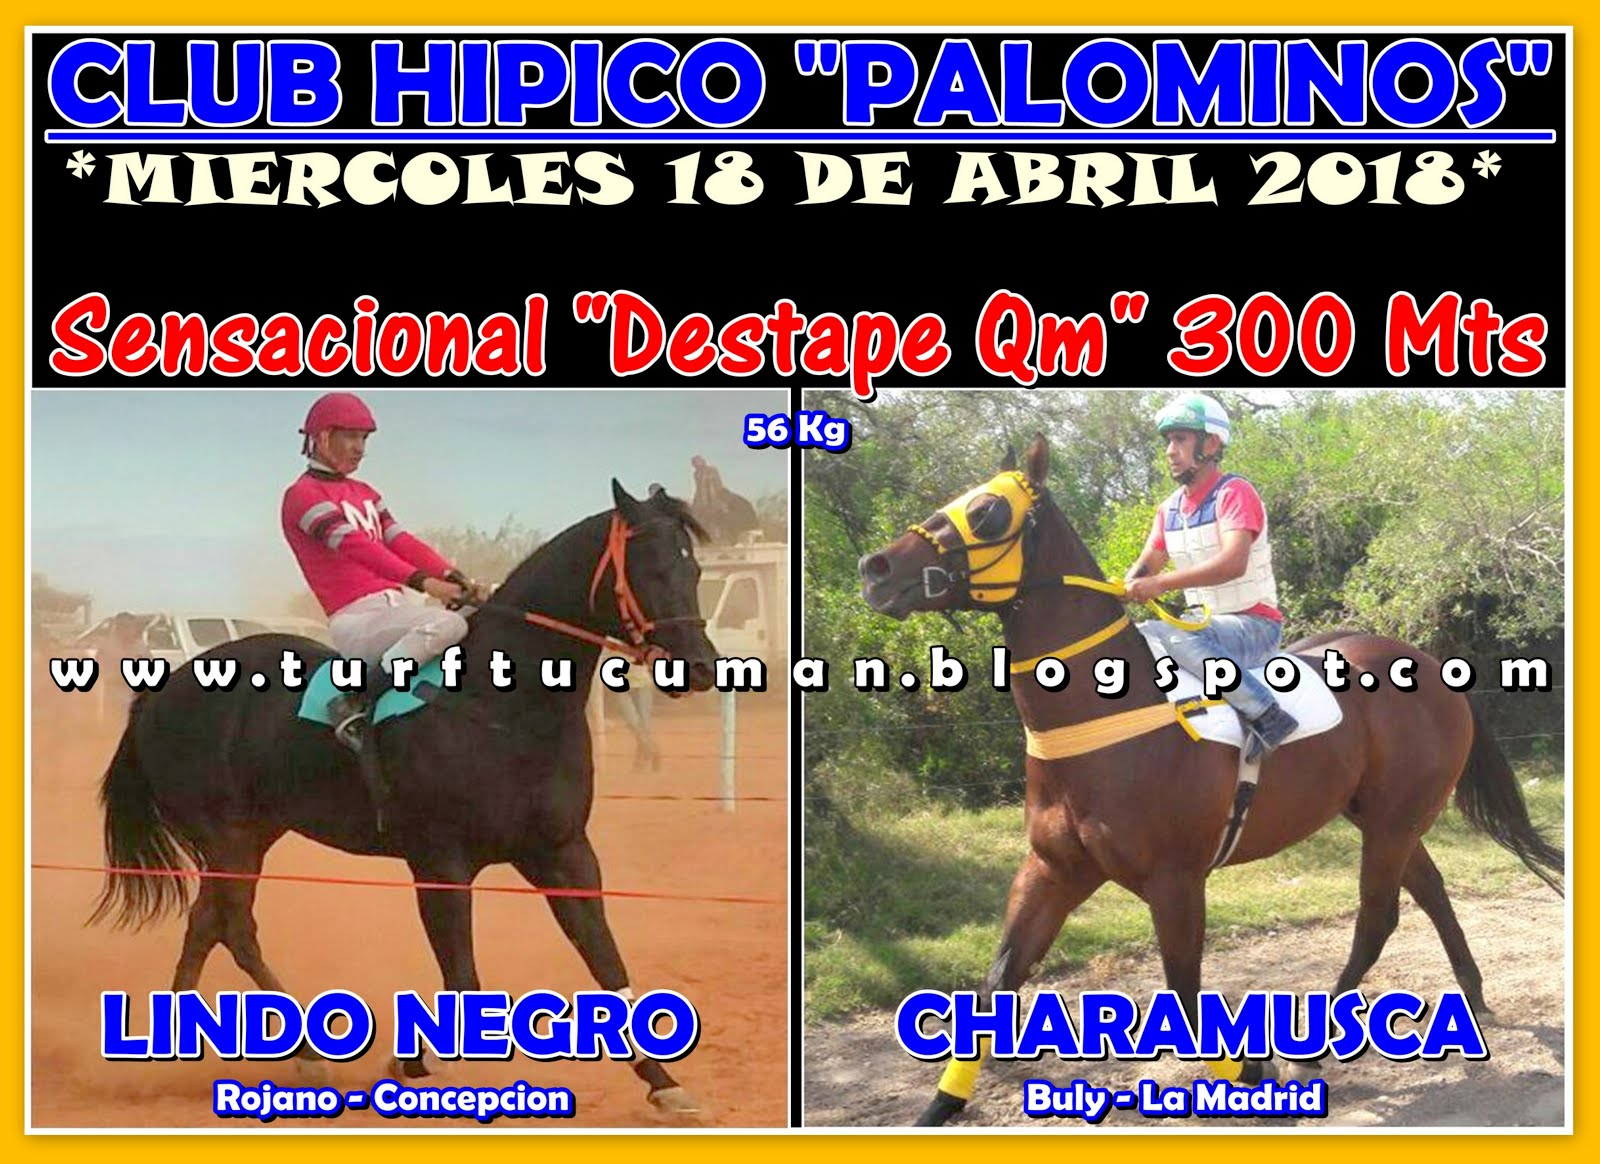 LINDO NEGRO VS CHARAMUSCA